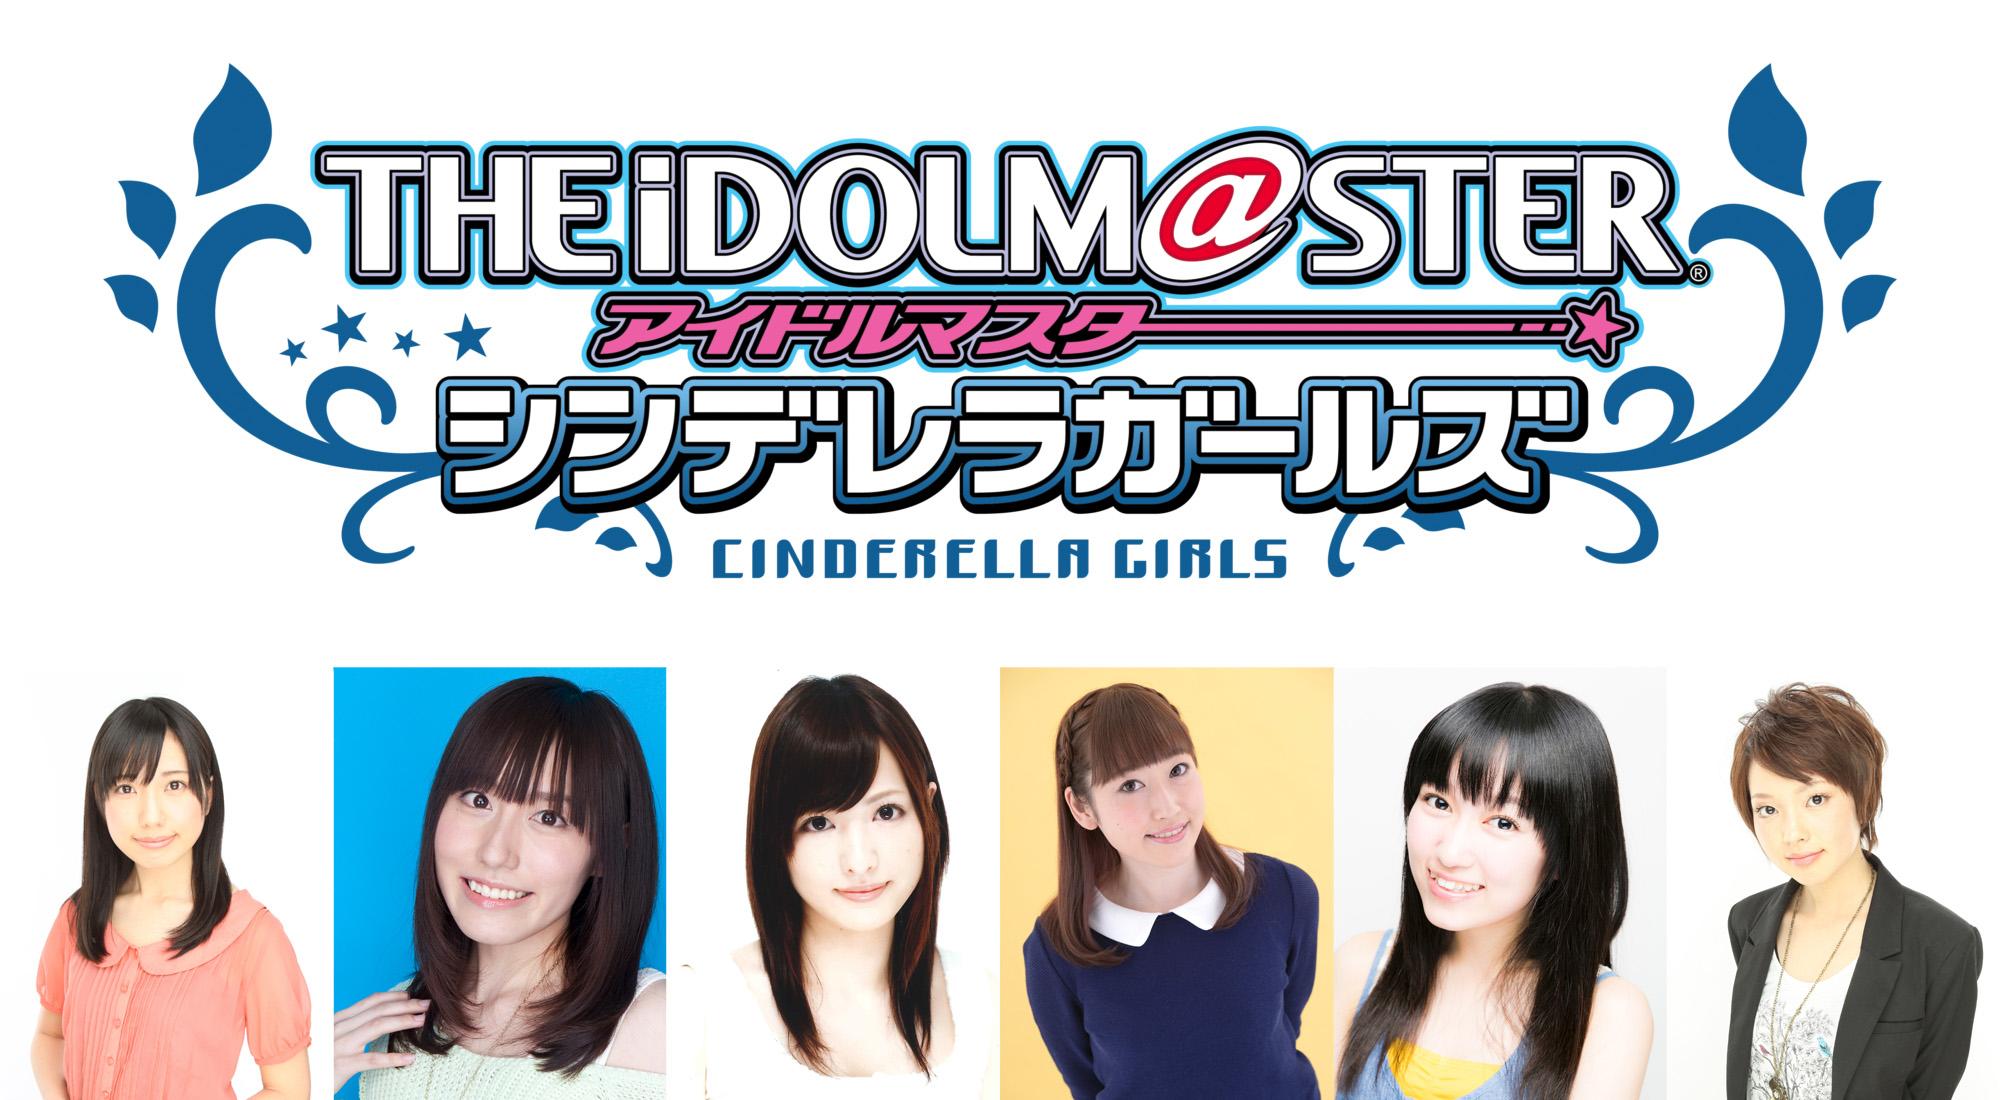 NekoPOP-Idolmaster-Cinderella-Girls-Anisong-World-Matsuri-Anime-Expo-2017